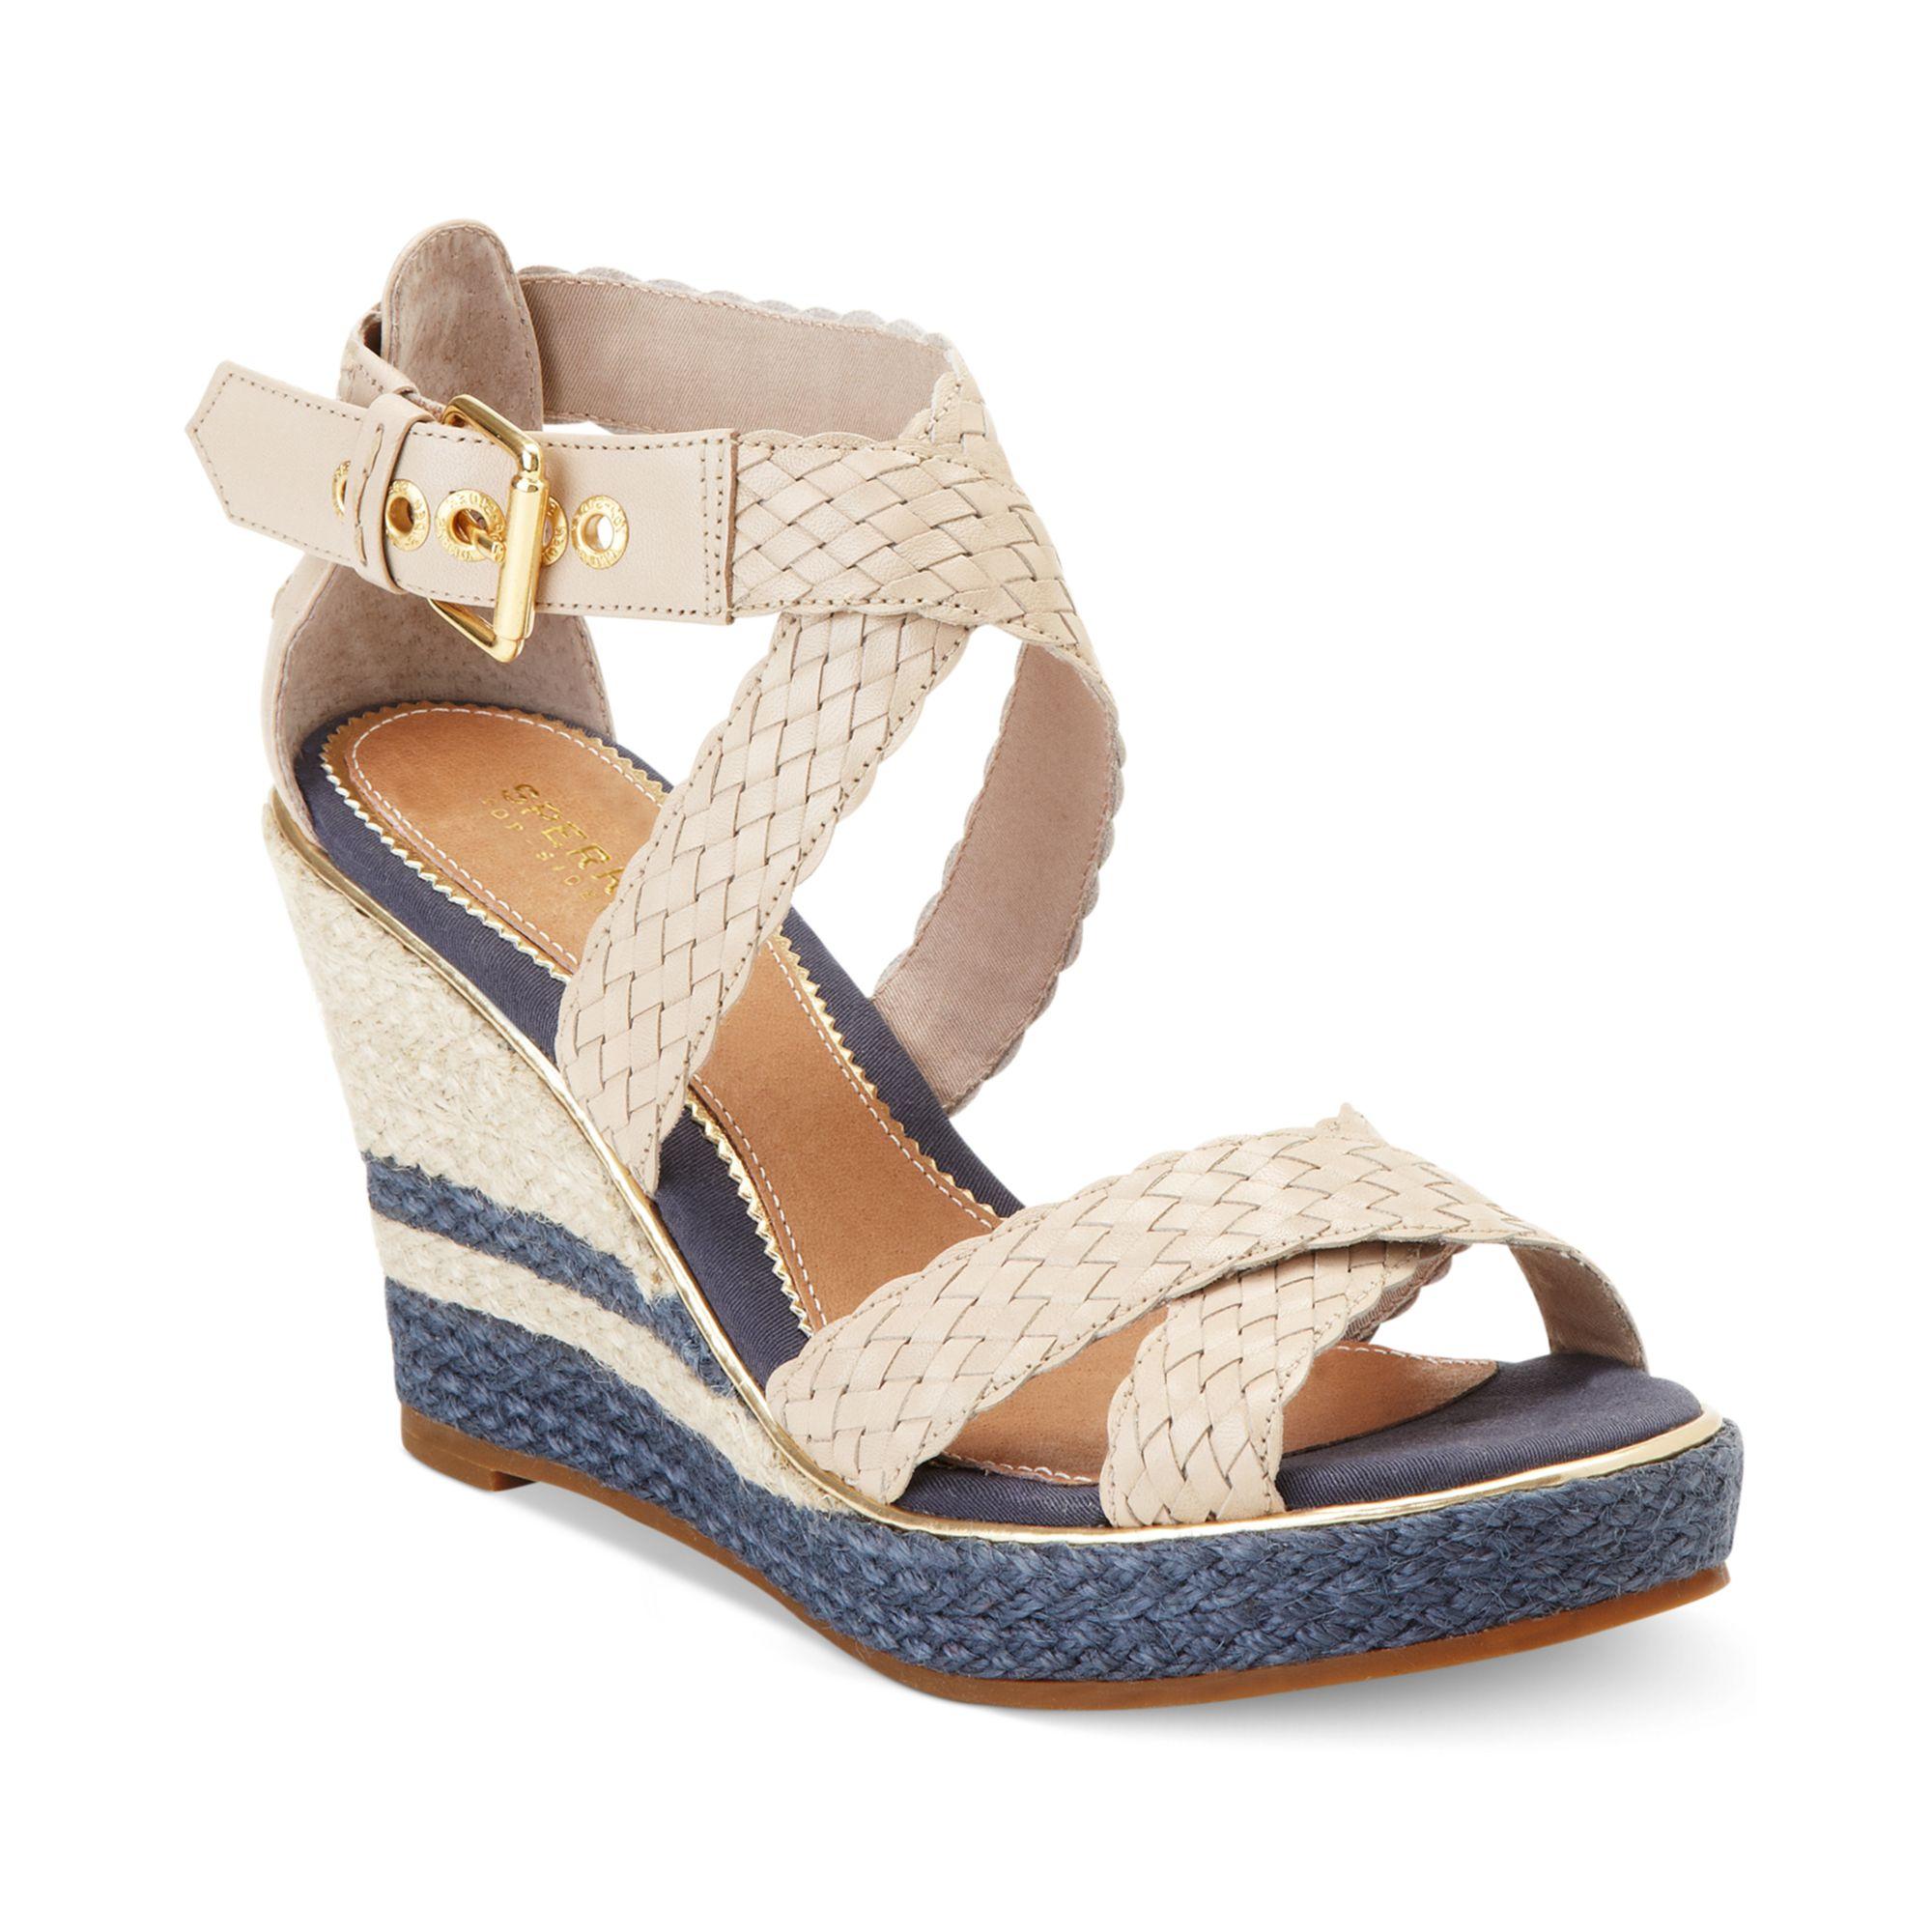 sperry top sider womens harbordale platform wedge sandals